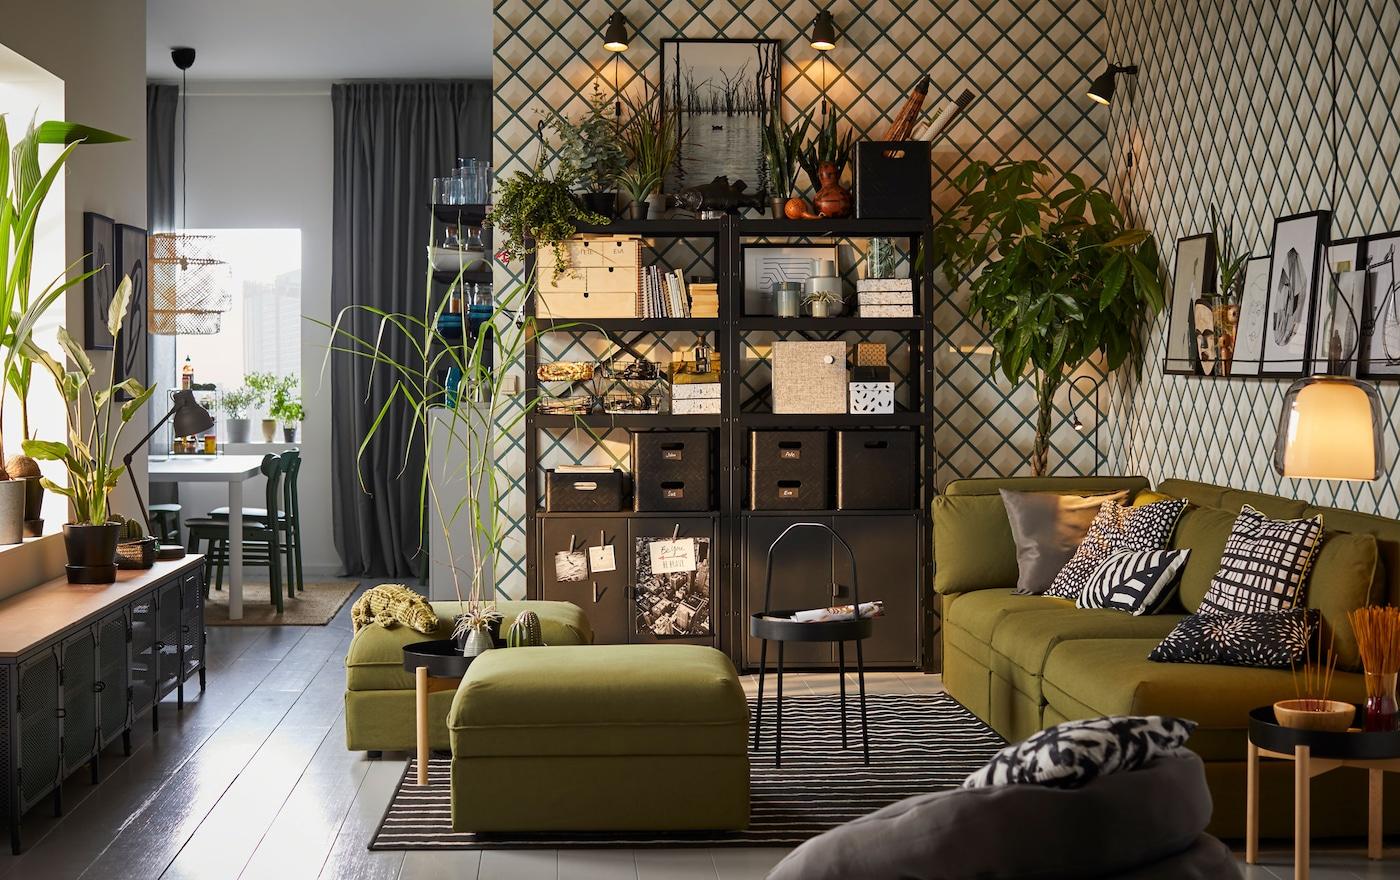 Ikea Rode Leren Bank.Living Room Ideas Home Furnishing Ikea Ikea